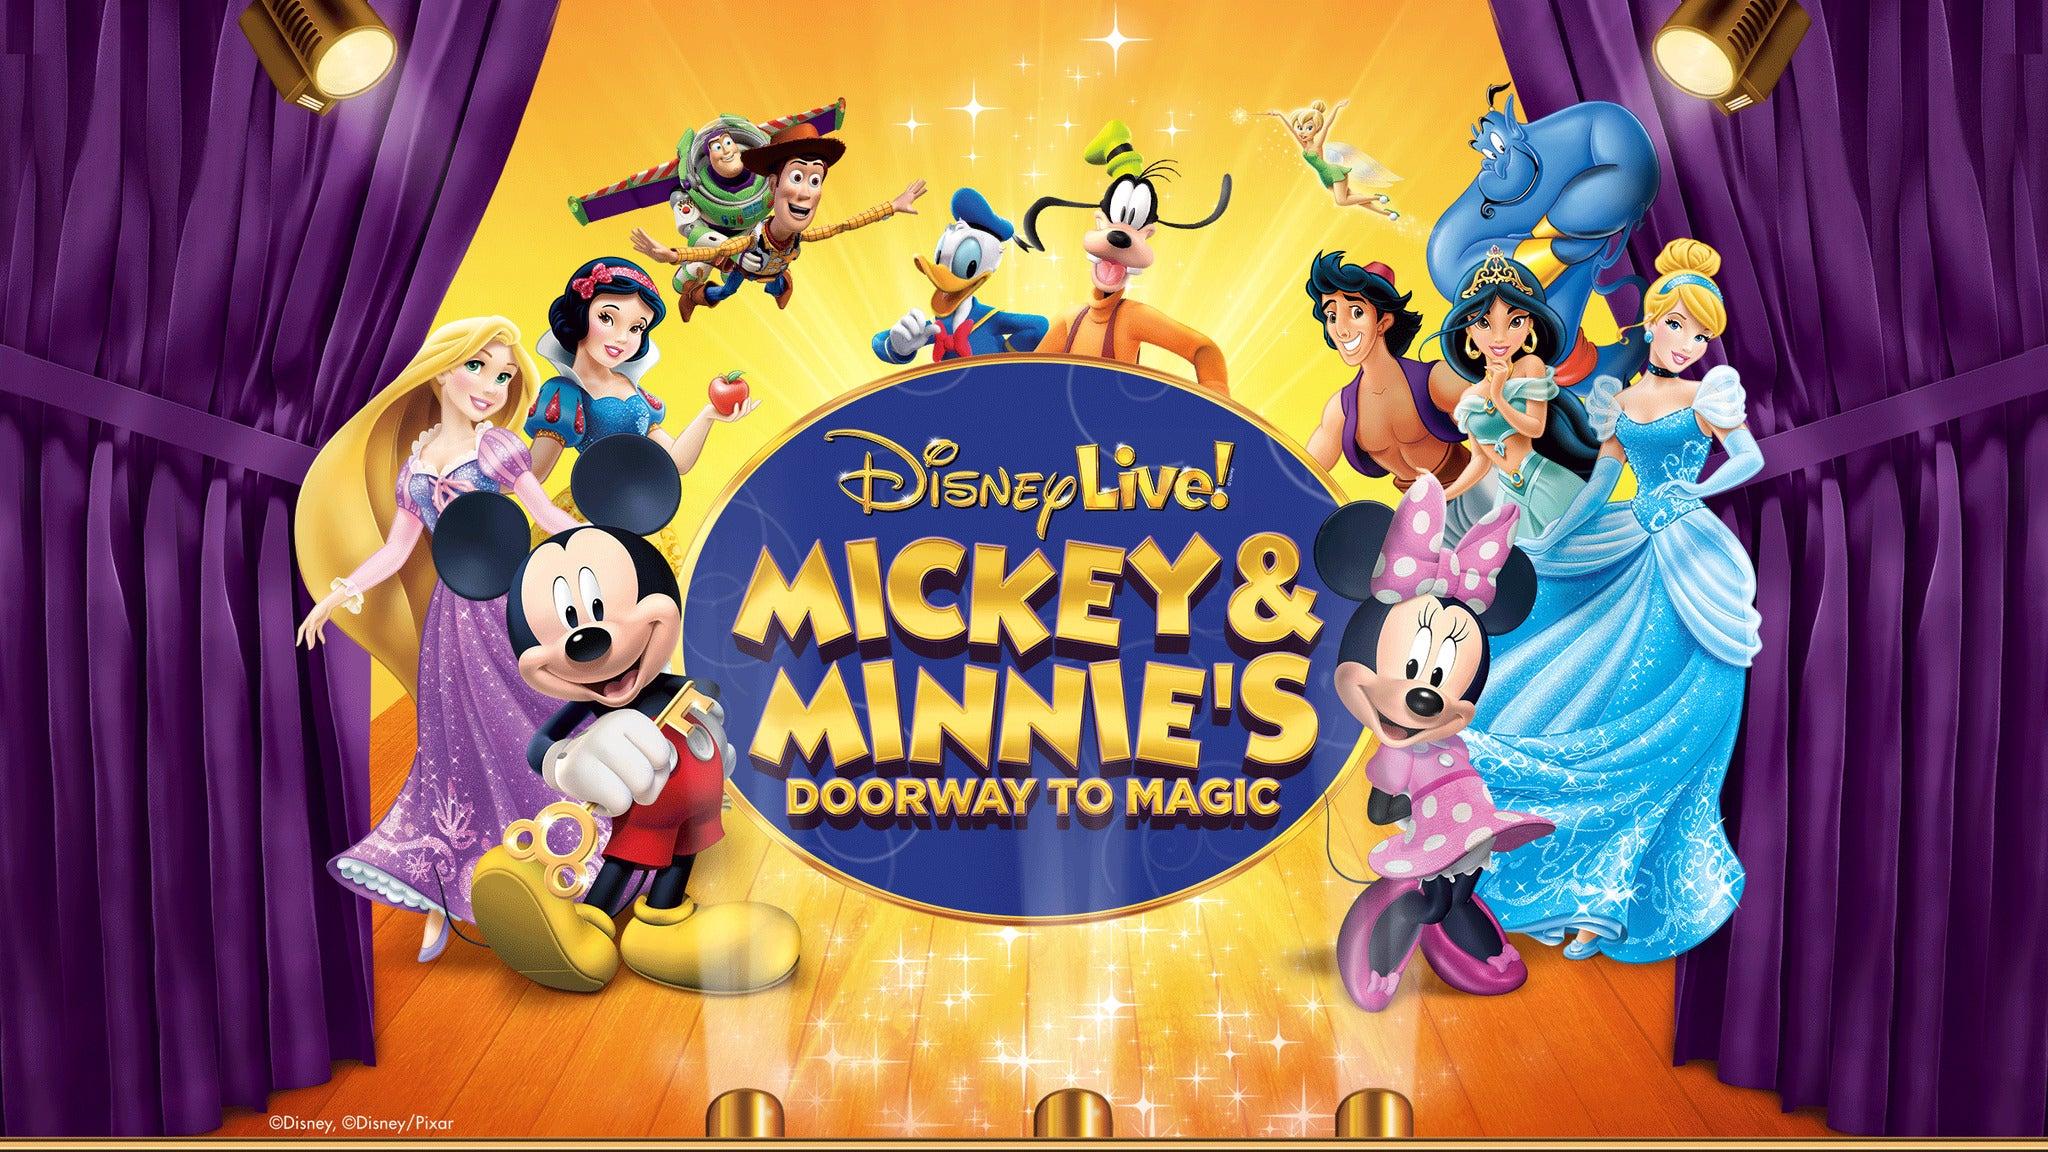 Disney Live! Mickey and Minnie's Doorway to Magic